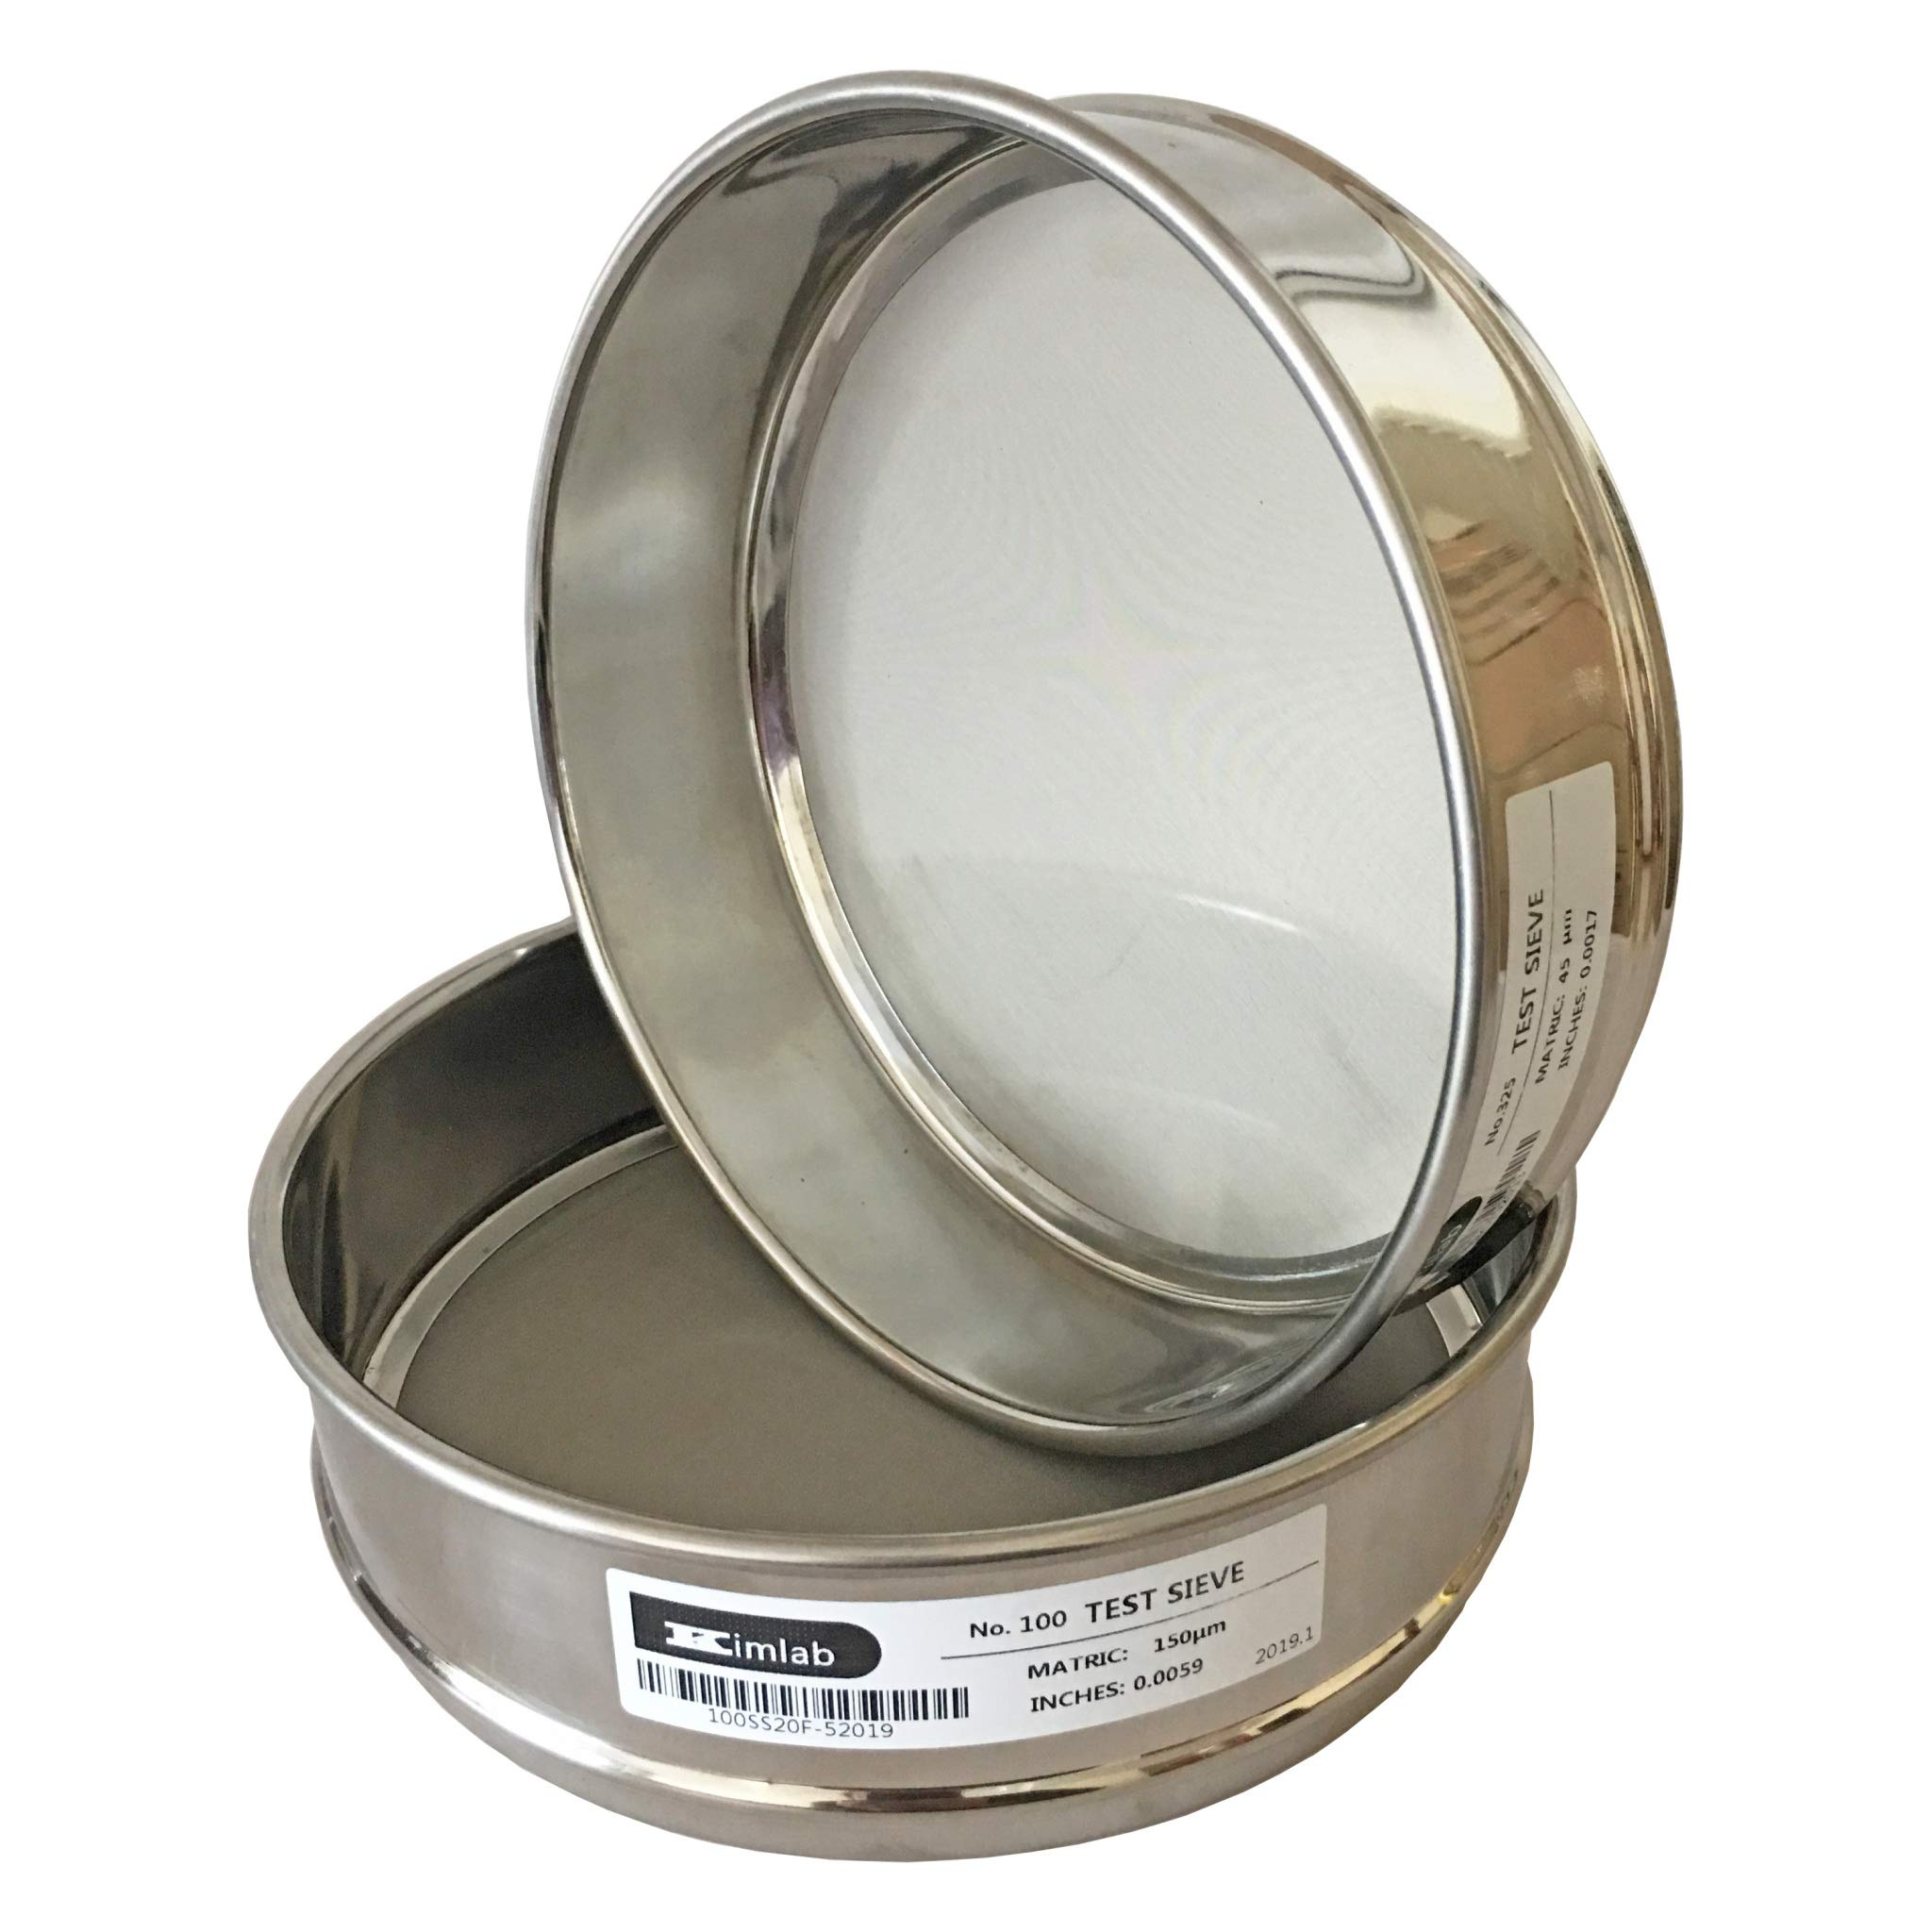 KimLab ISO3310 STD Test Sieve #50 / 300μm Mesh Size,All Stainless Steel,200mm Diameter by KimLab